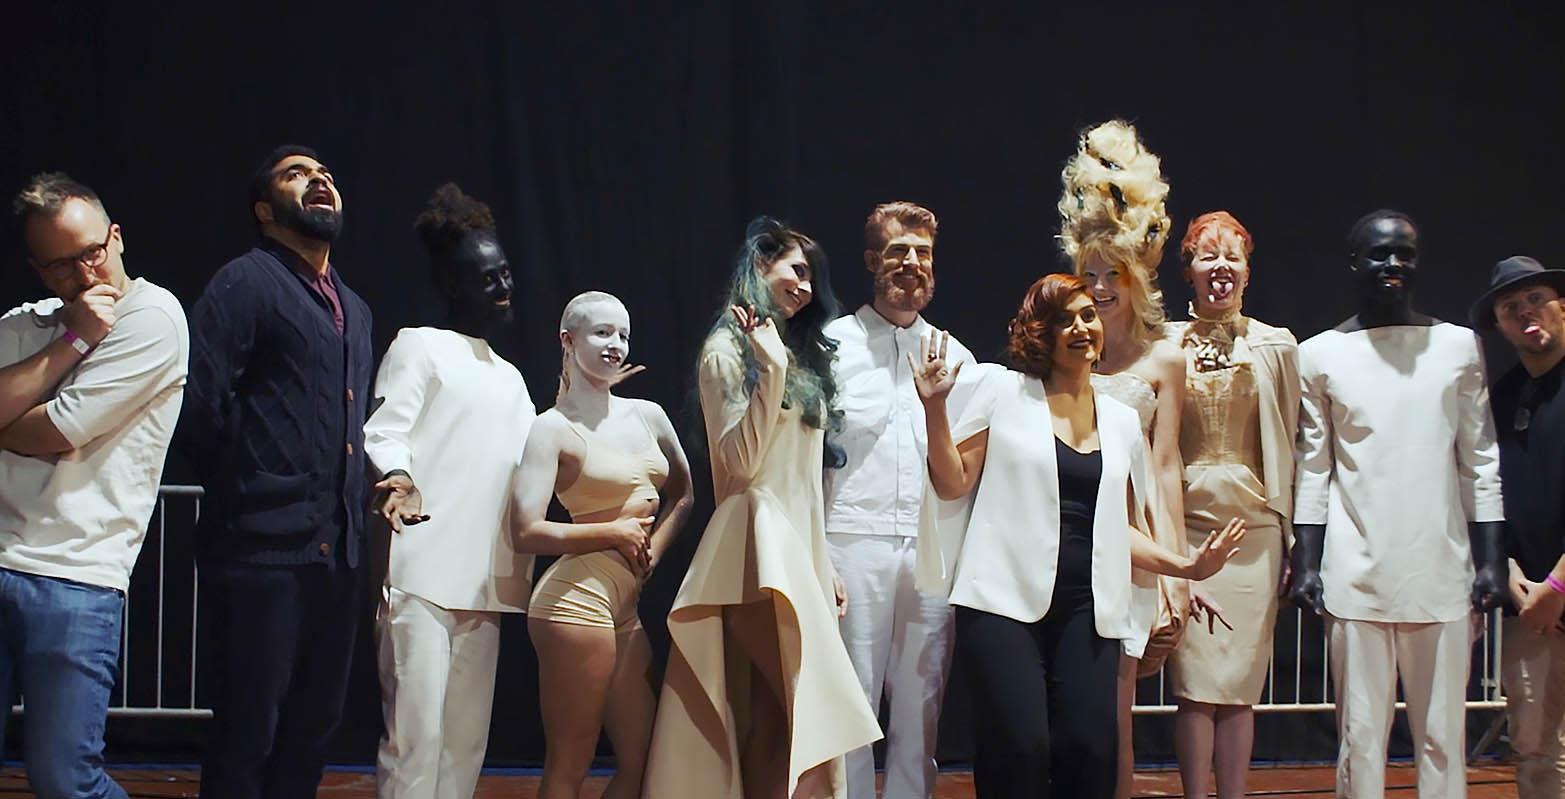 Team of Sevda Durukan promoted by JOYCO winner of the hair games , brussel filmed by Jason Berkley Studios Van Gogh Style